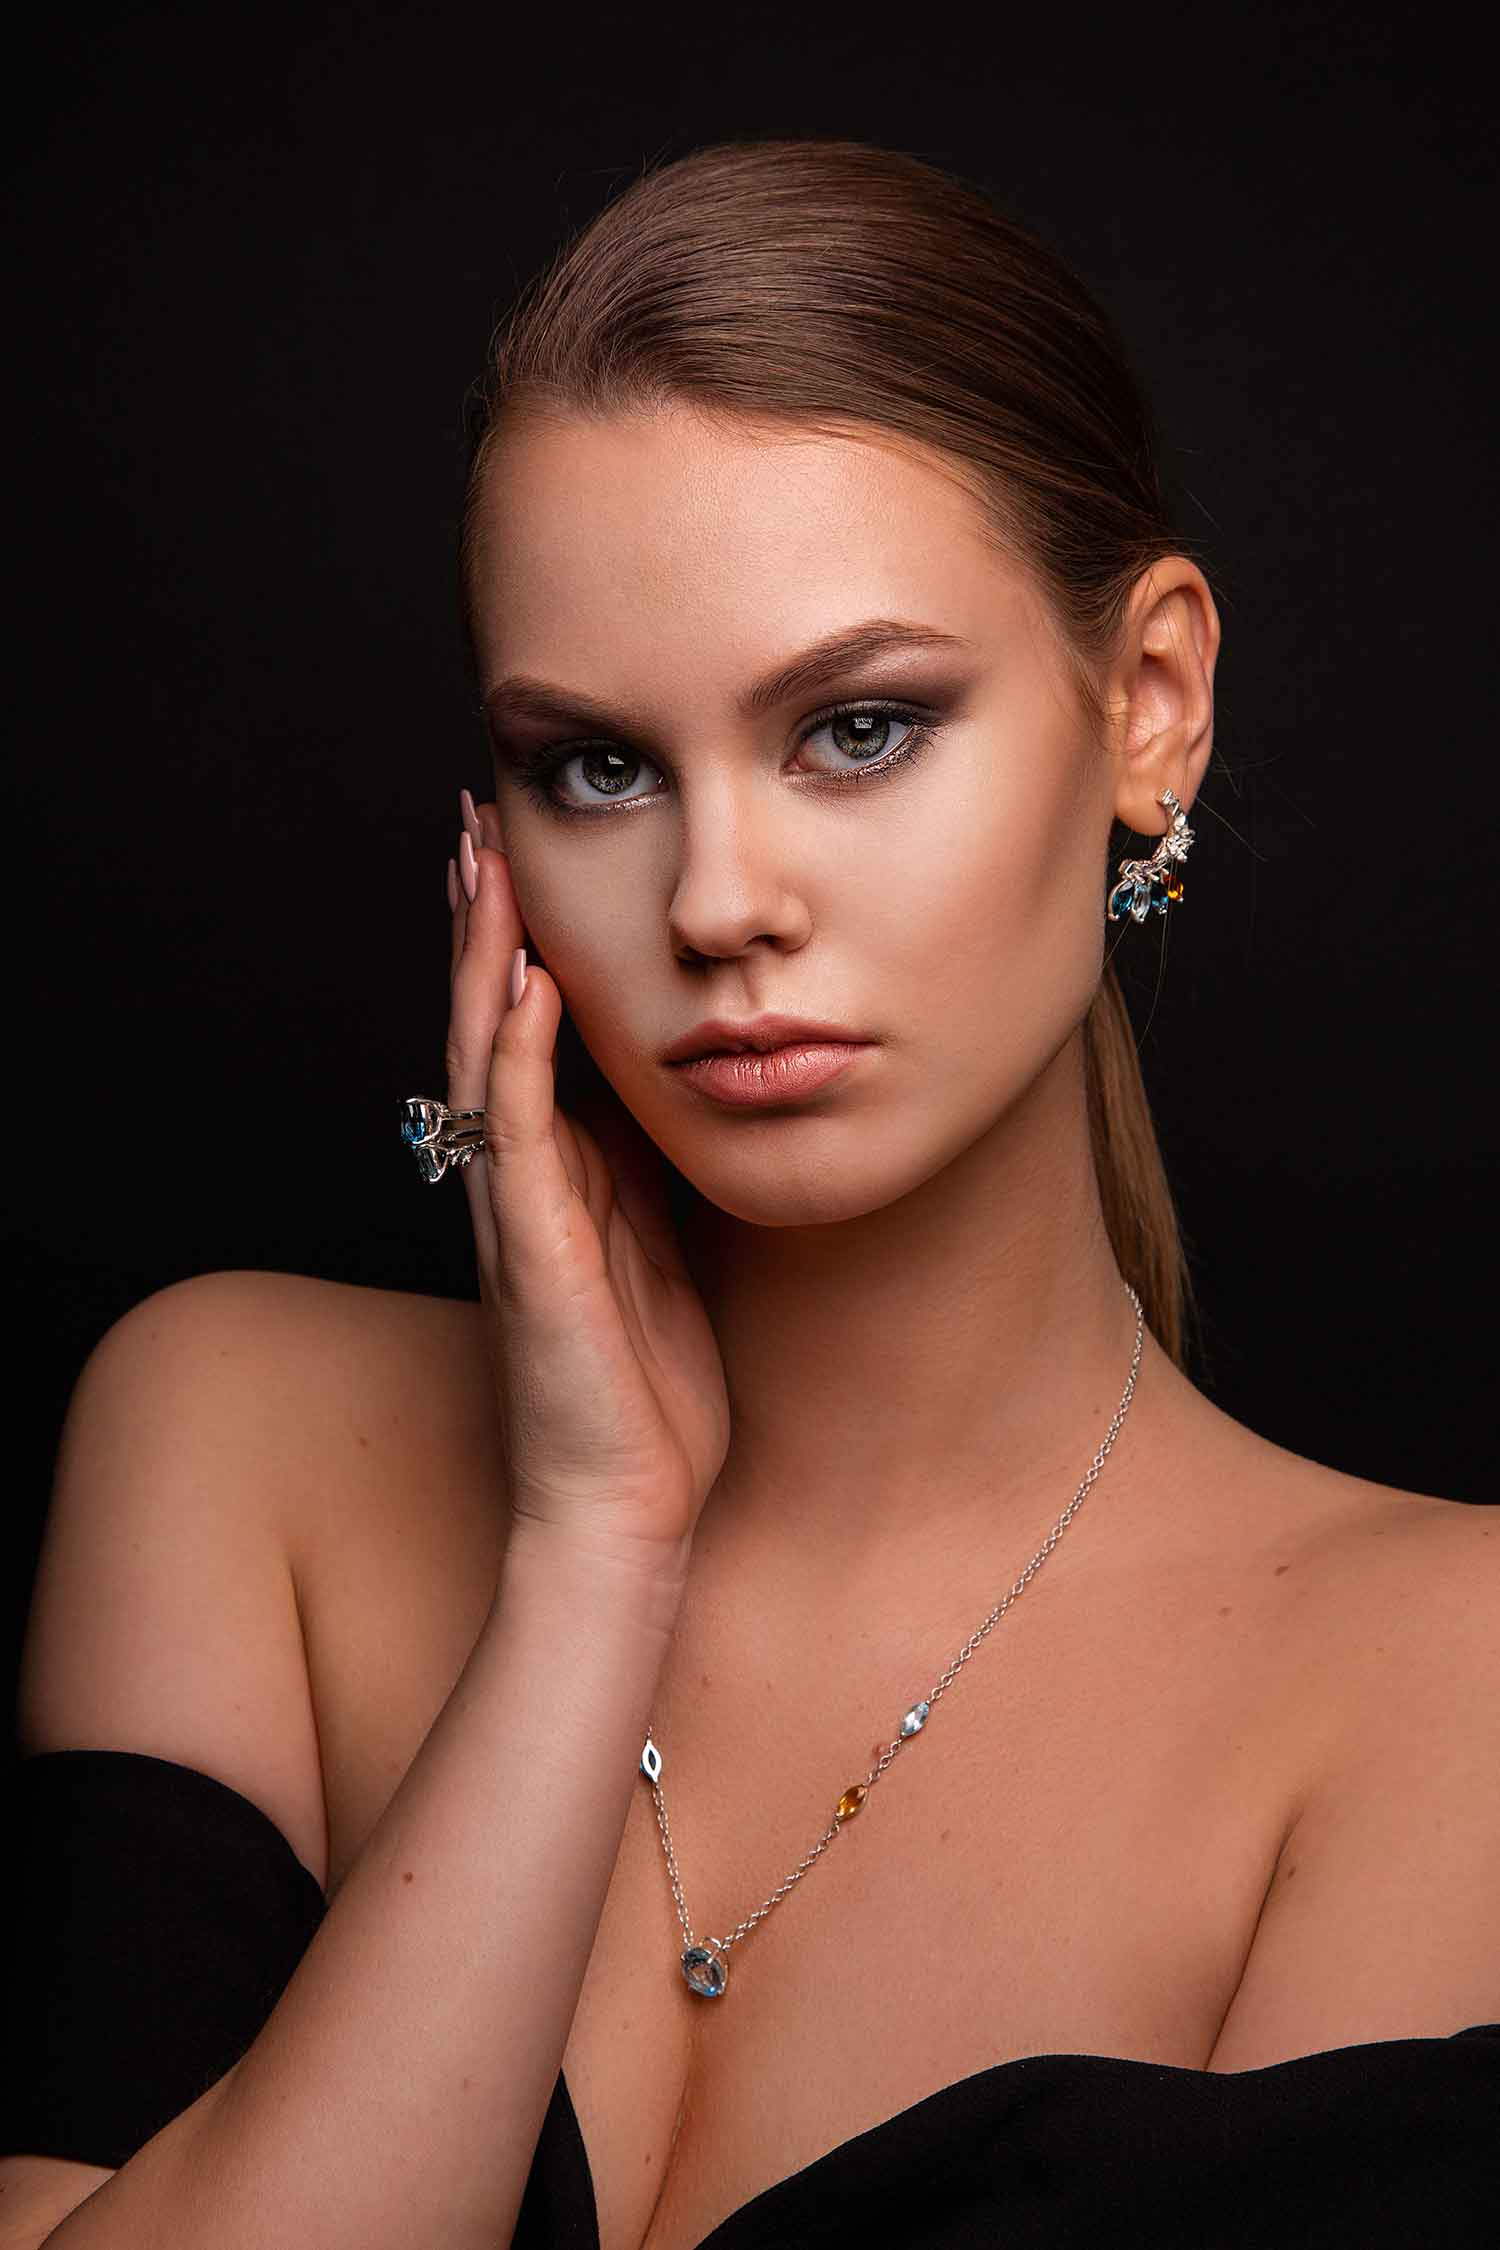 Model in lavish black dress wearing Zydrune high-end gemstone jewellery set.